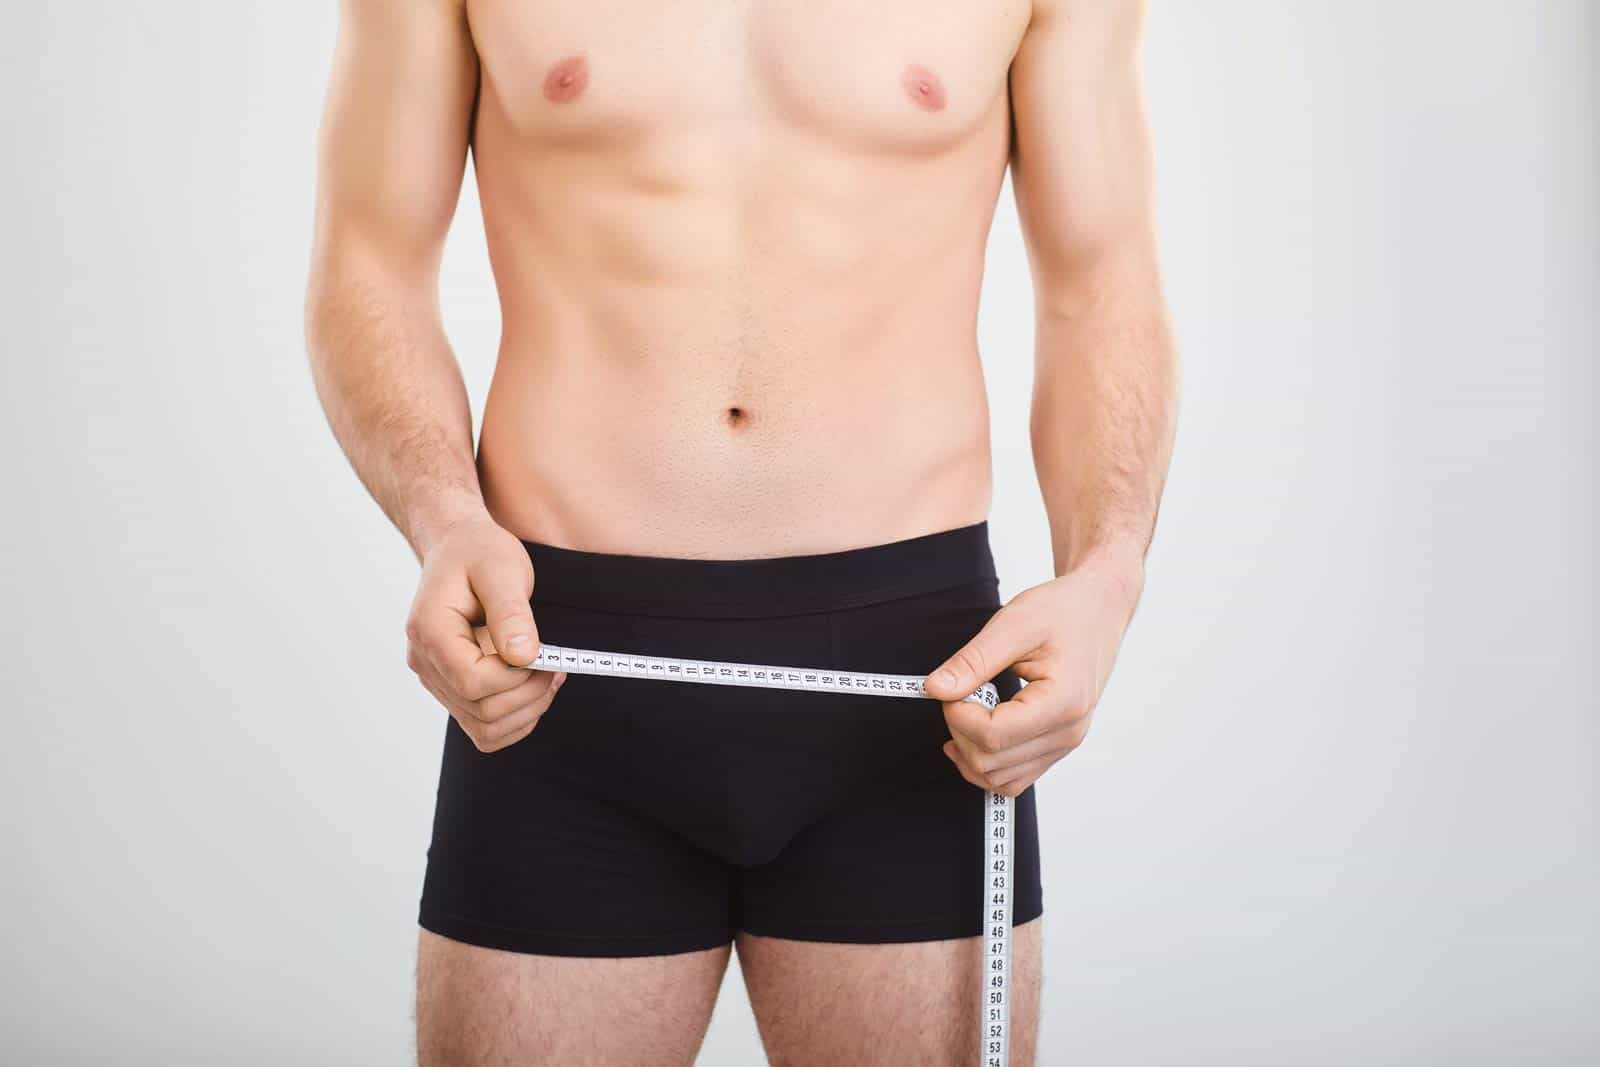 Pumpice za penis